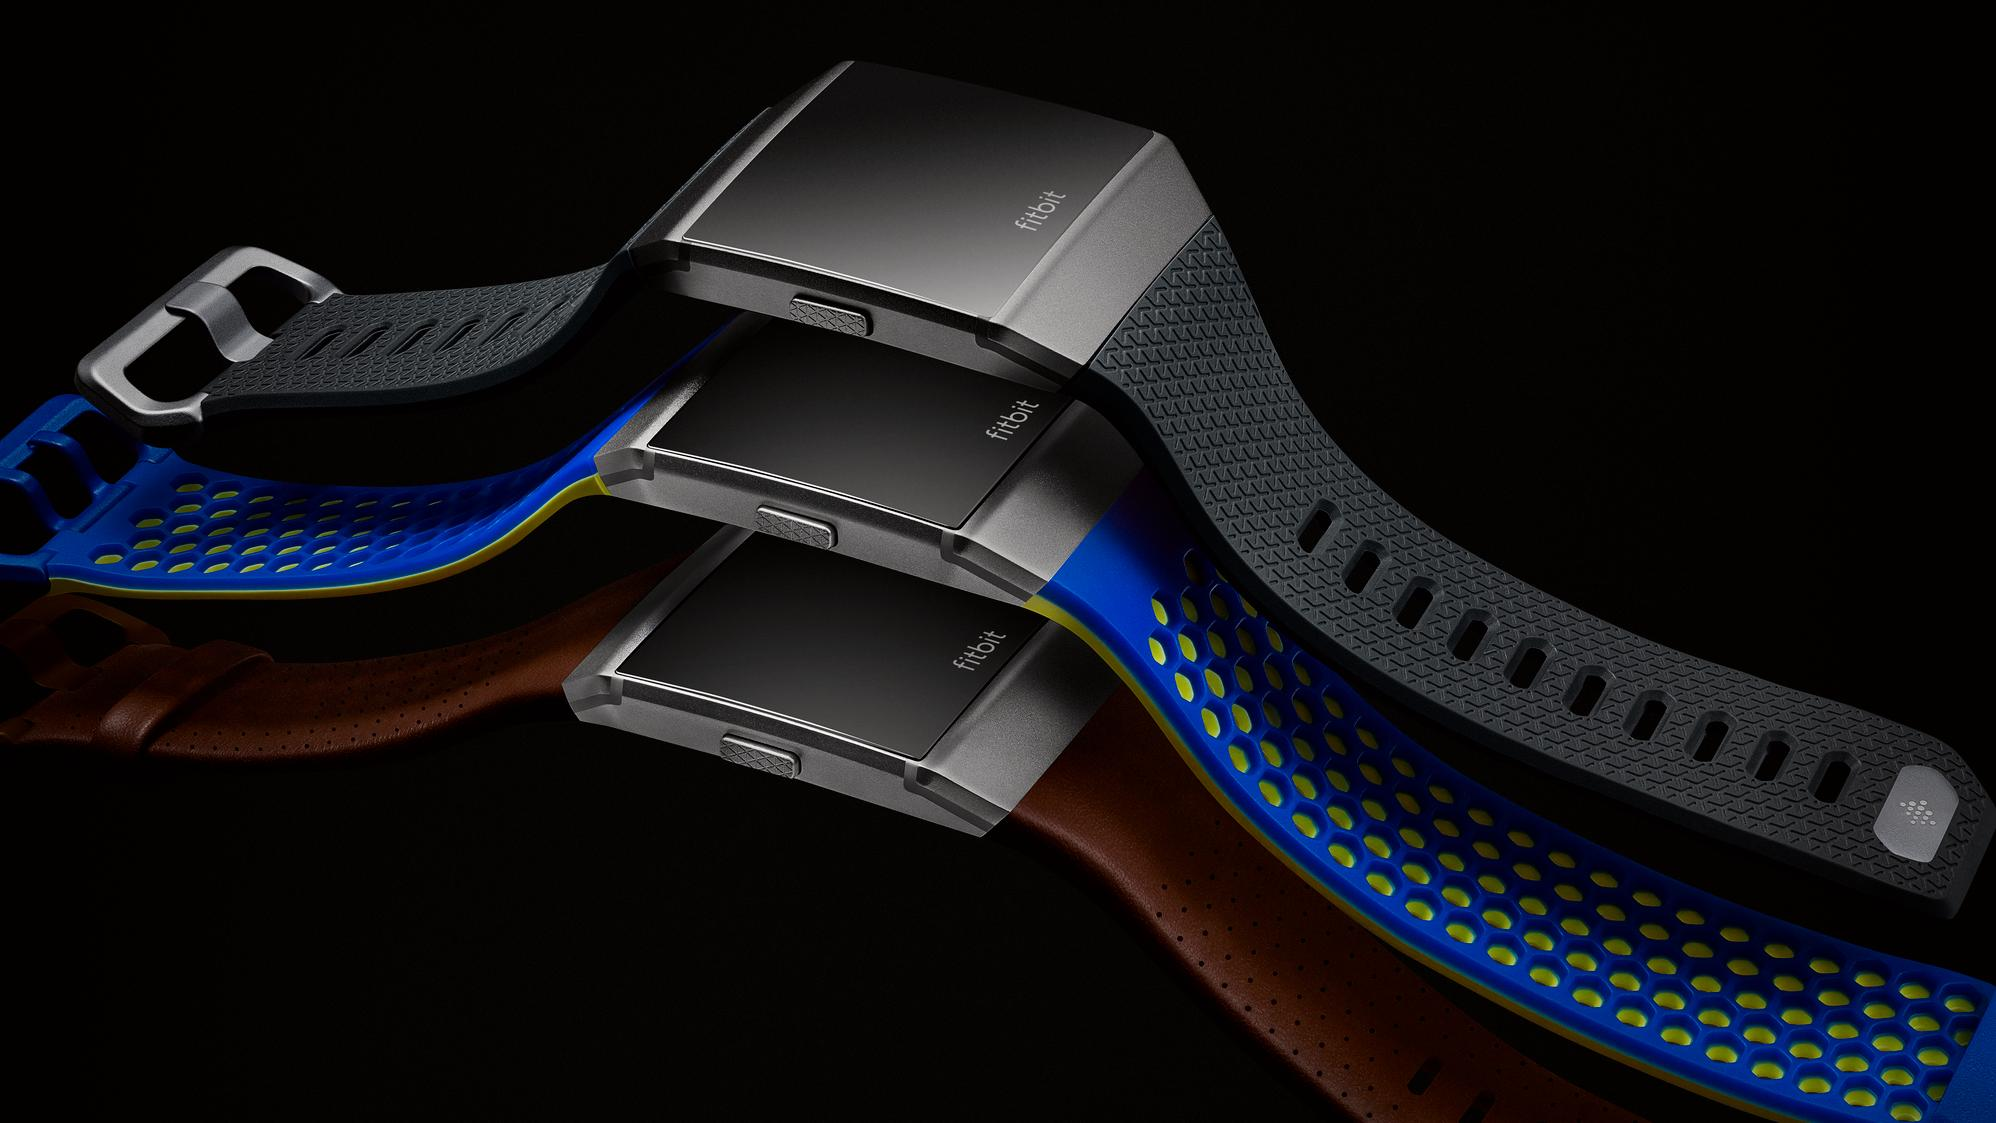 Fitbit går til kamp mot Apple – lanserer smartklokke og sine aller første øreplugger